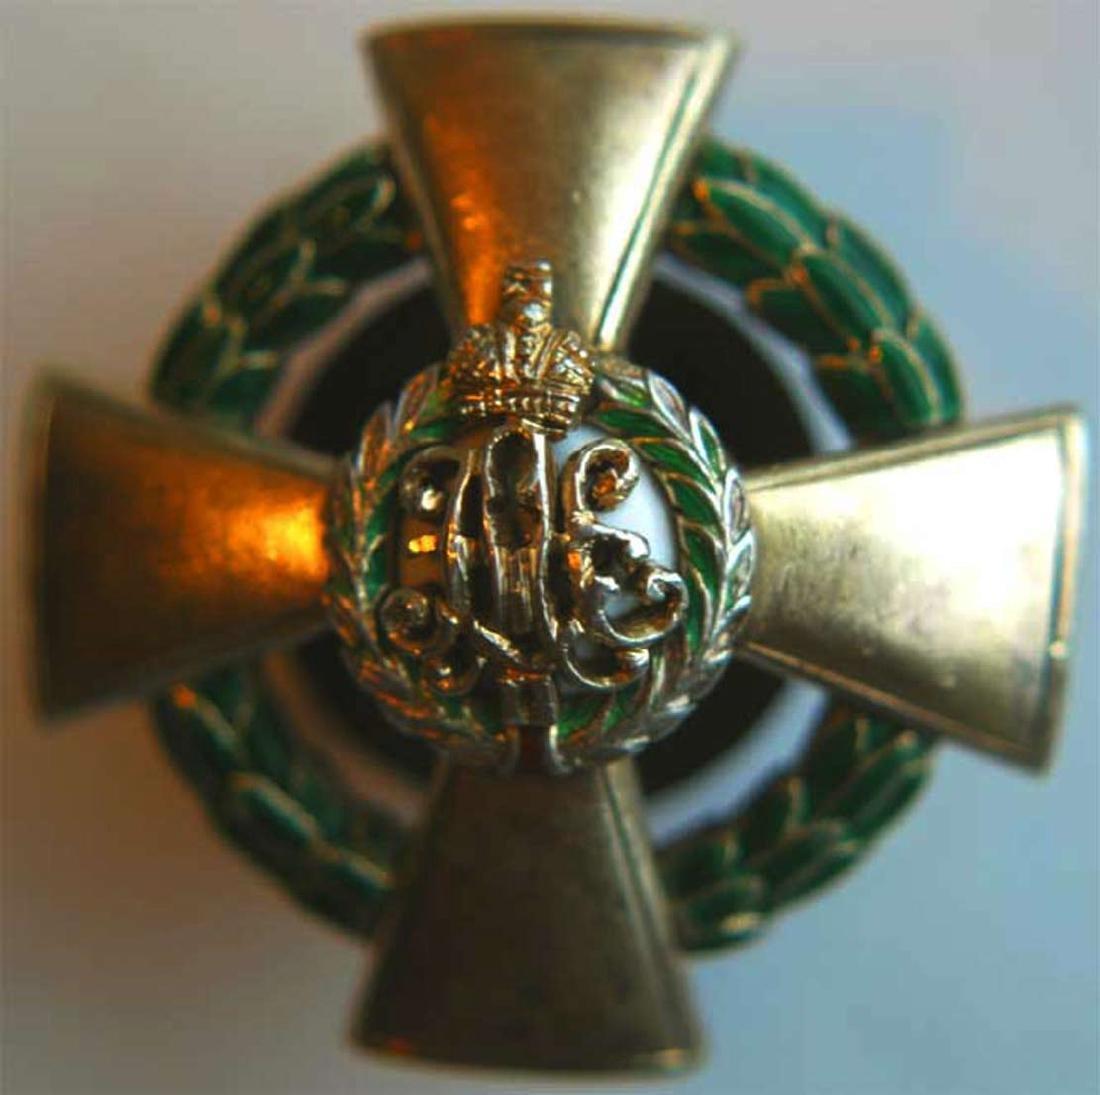 Russian Imperial Badge 91st Dvinsk Infantry Regiment